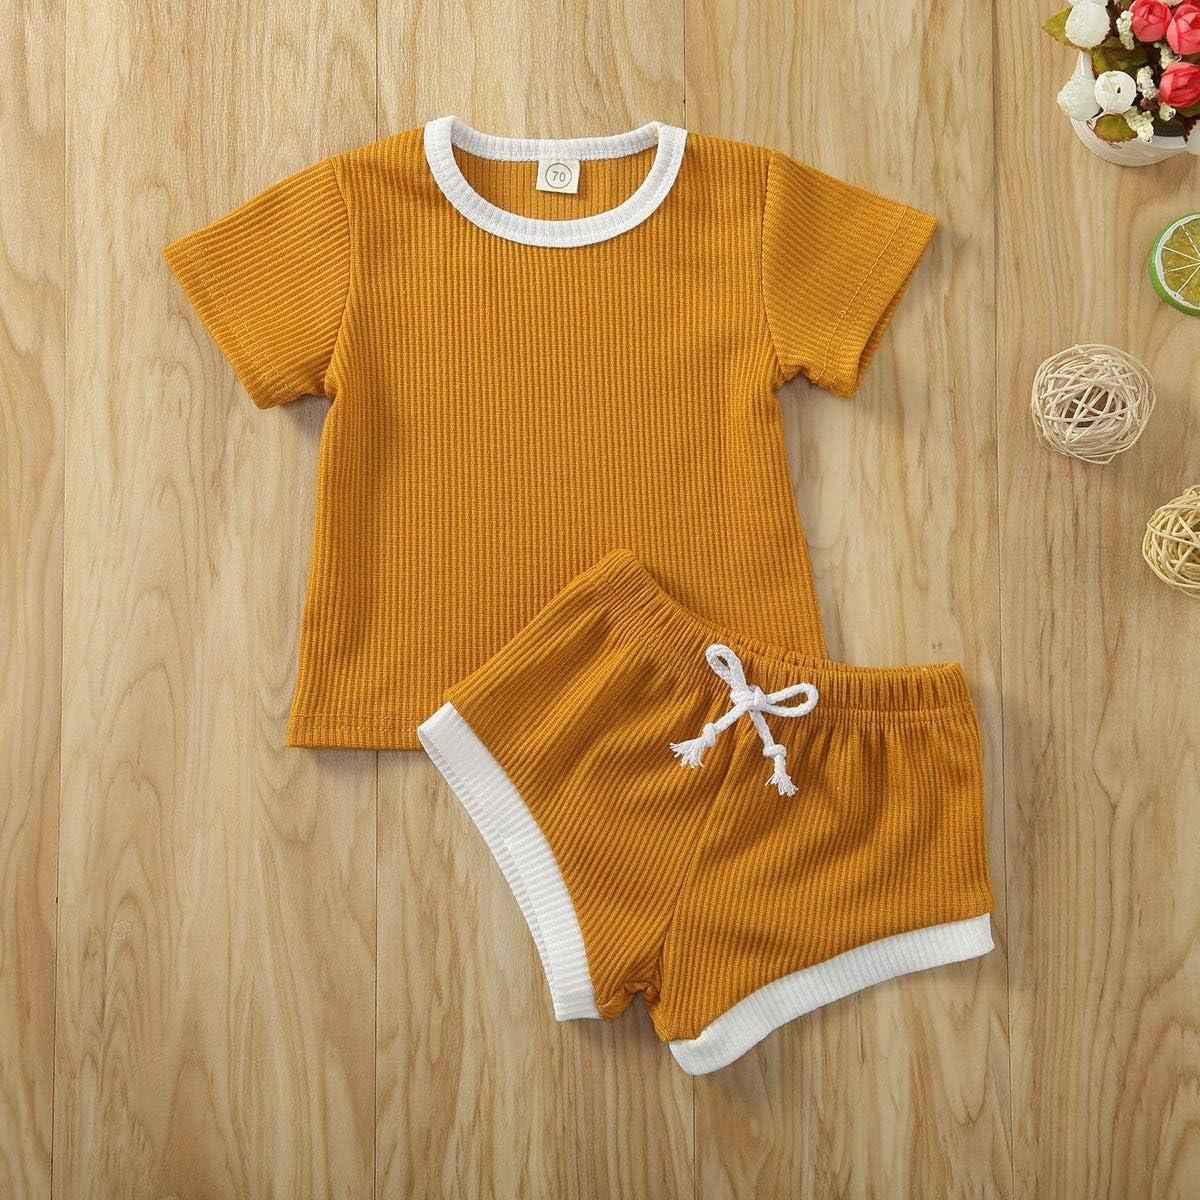 Toddler Baby Boys Girls Summer Clothing Ribbed Knitted Short Sleeve T-Shirts+Shorts Tracksuits Sets